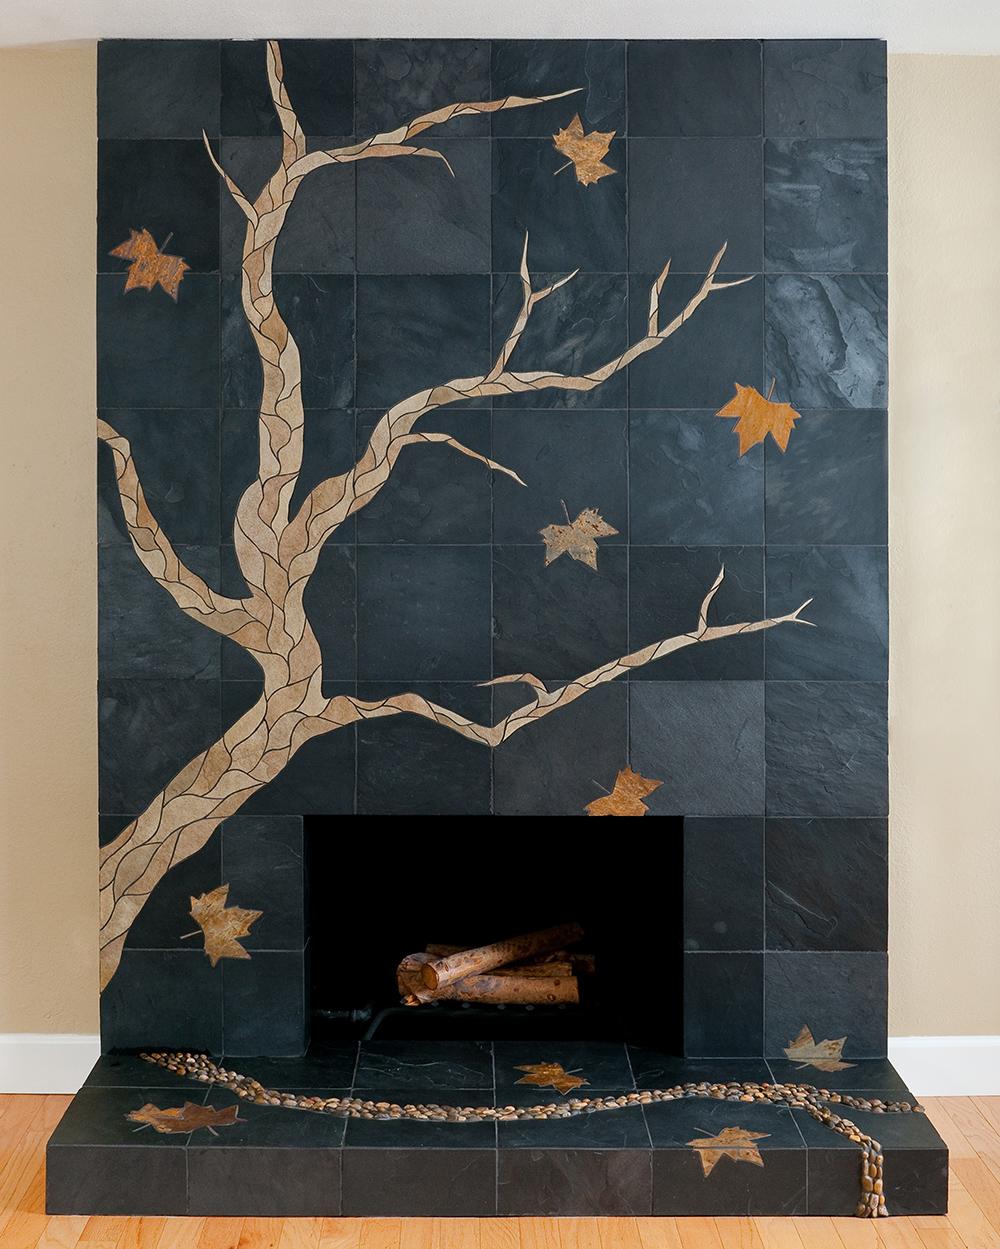 Artistic Creations Fireplace Portfolio-1.jpg